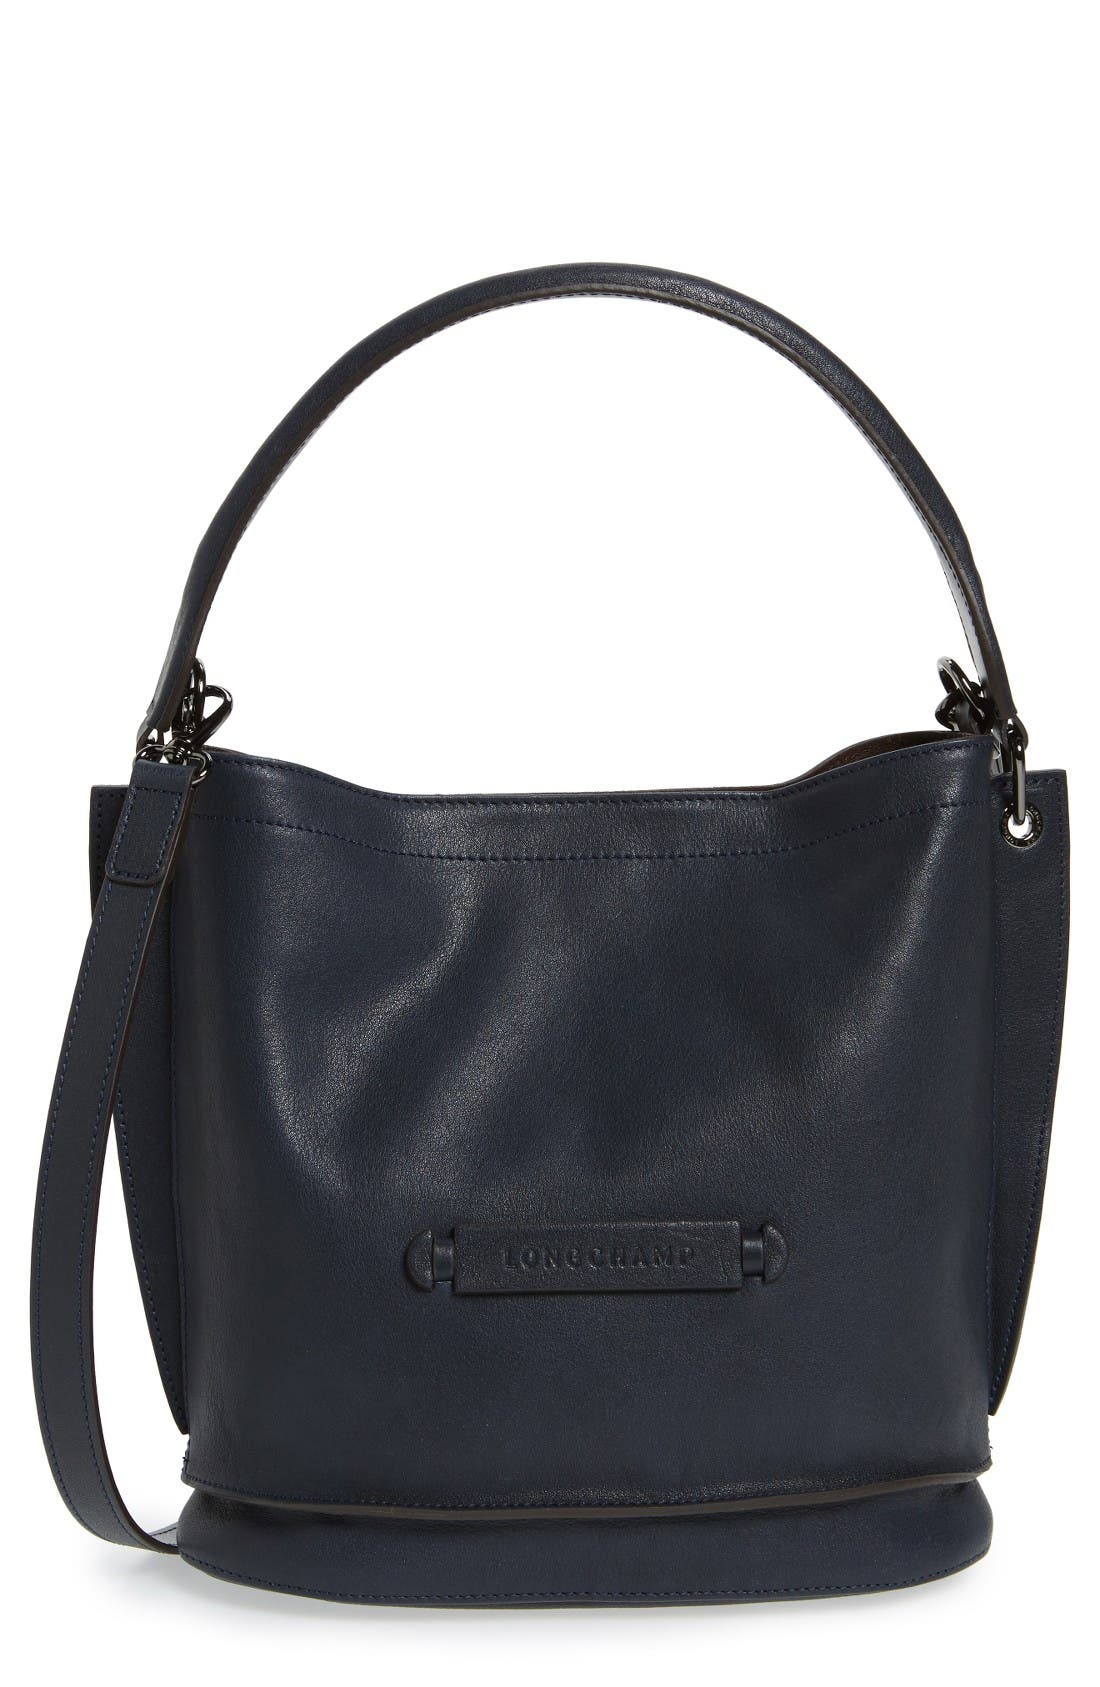 Longchamp '3D' Leather Crossbody Hobo